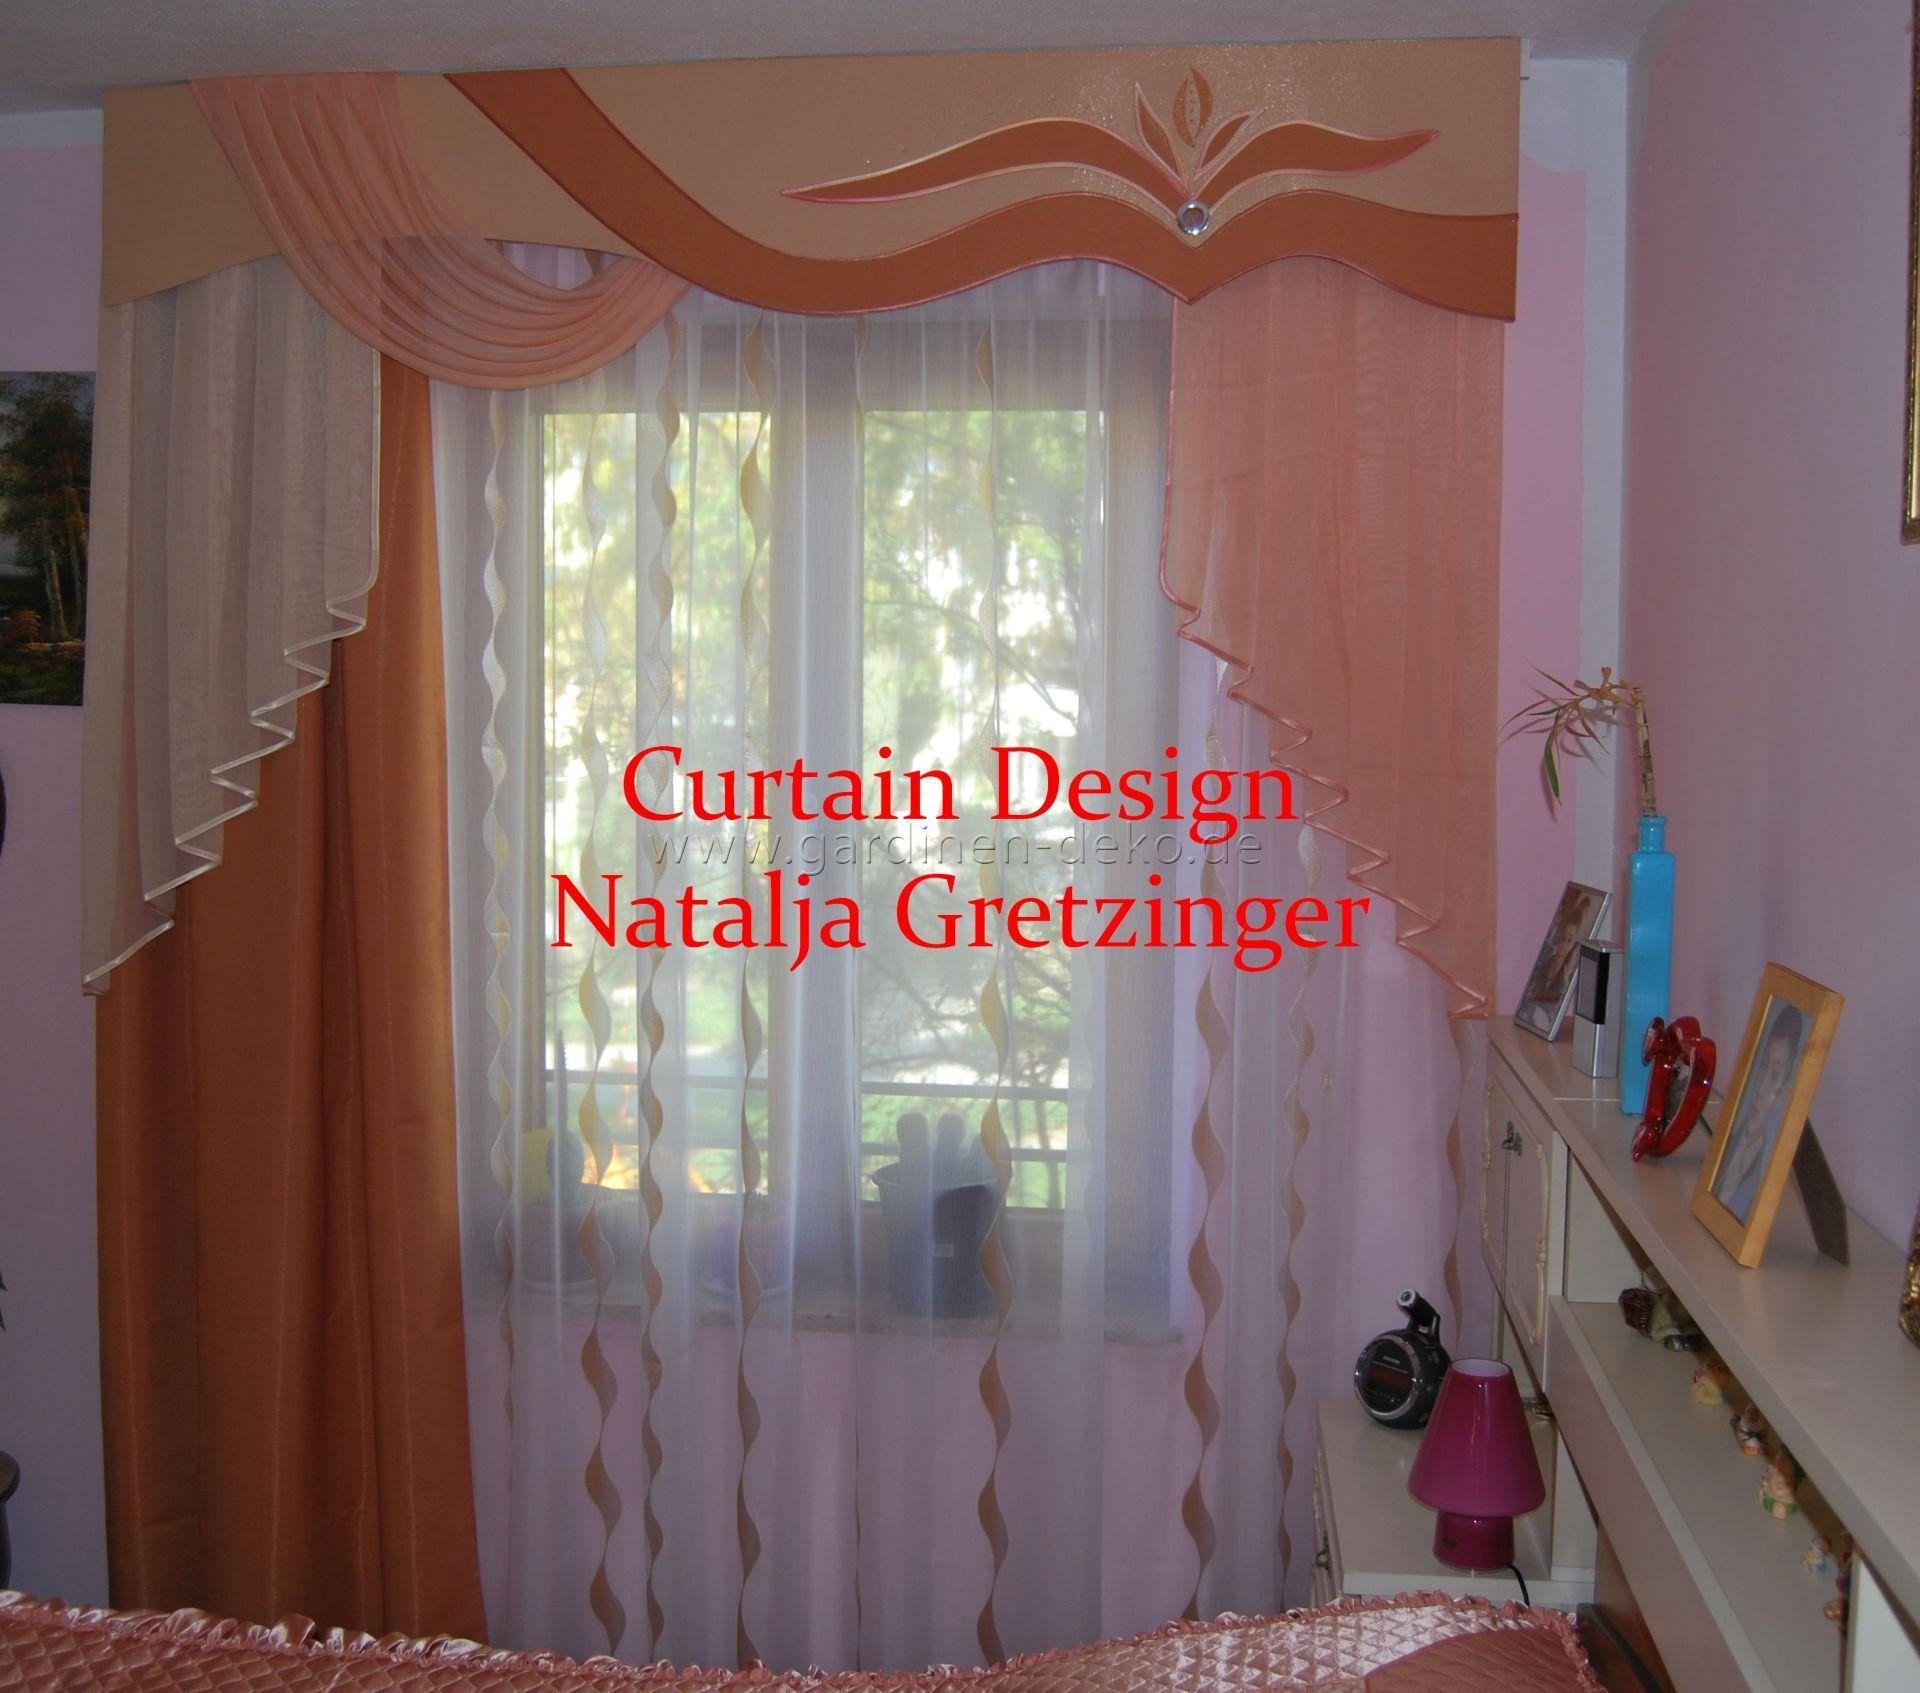 klassischer vorhang mit schabracke in orange. Black Bedroom Furniture Sets. Home Design Ideas